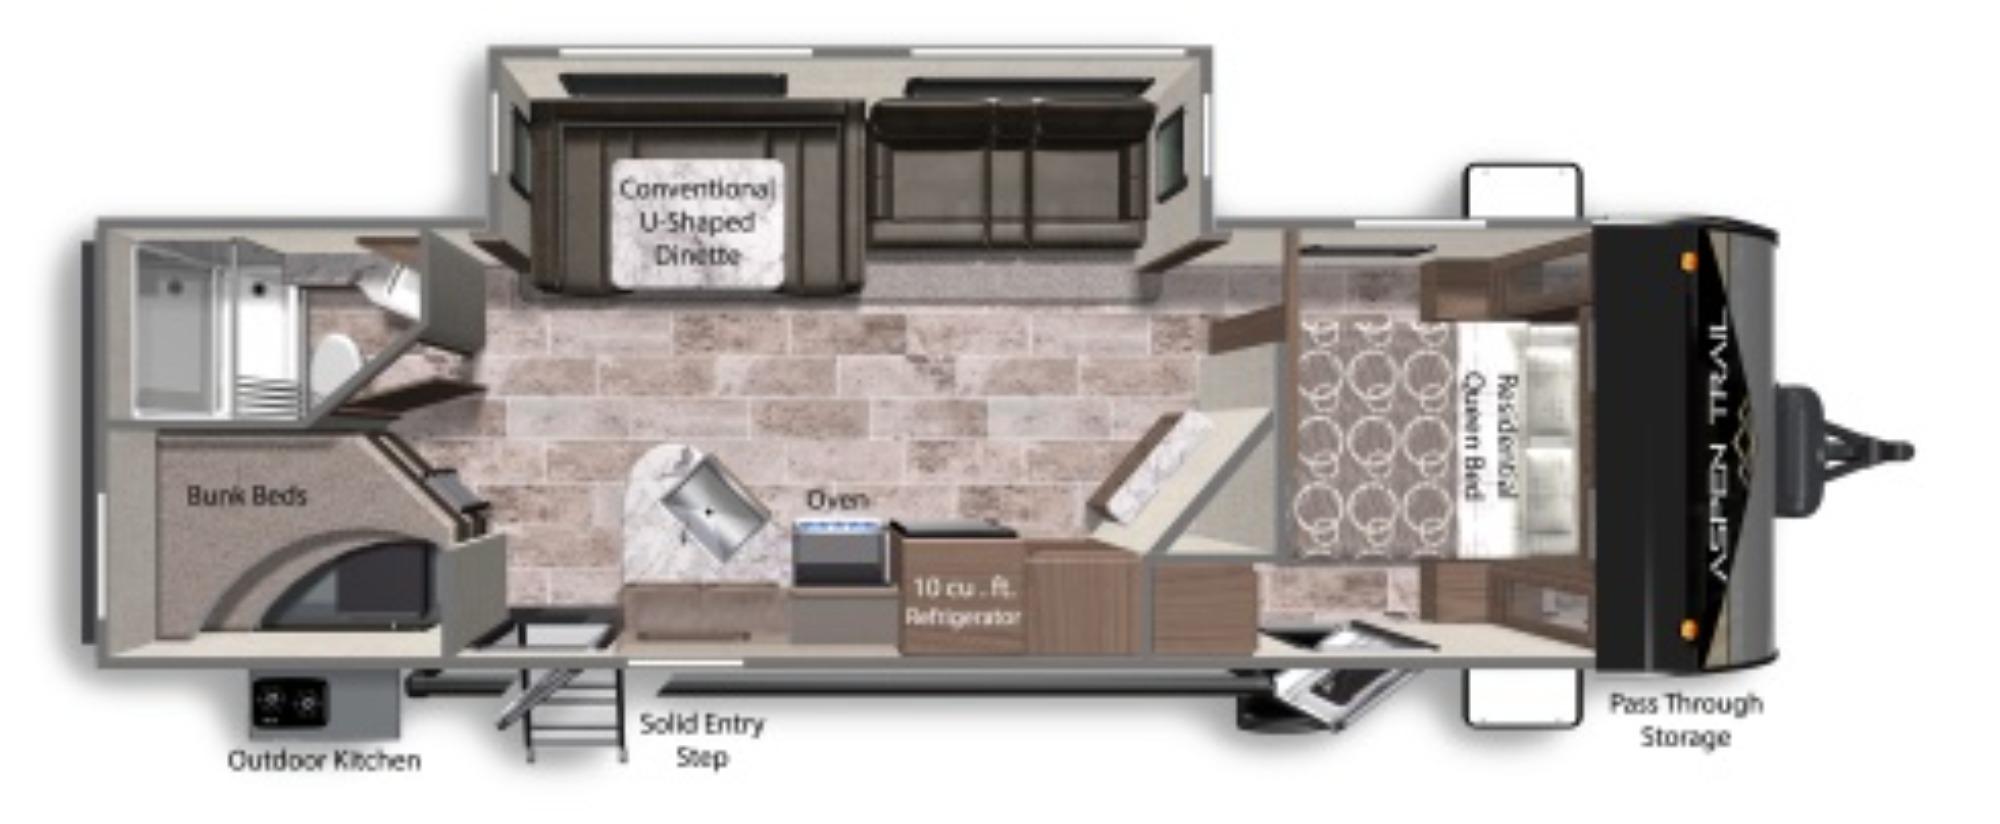 View Floor Plan for 2022 DUTCHMEN ASPEN TRAIL 2850BHS